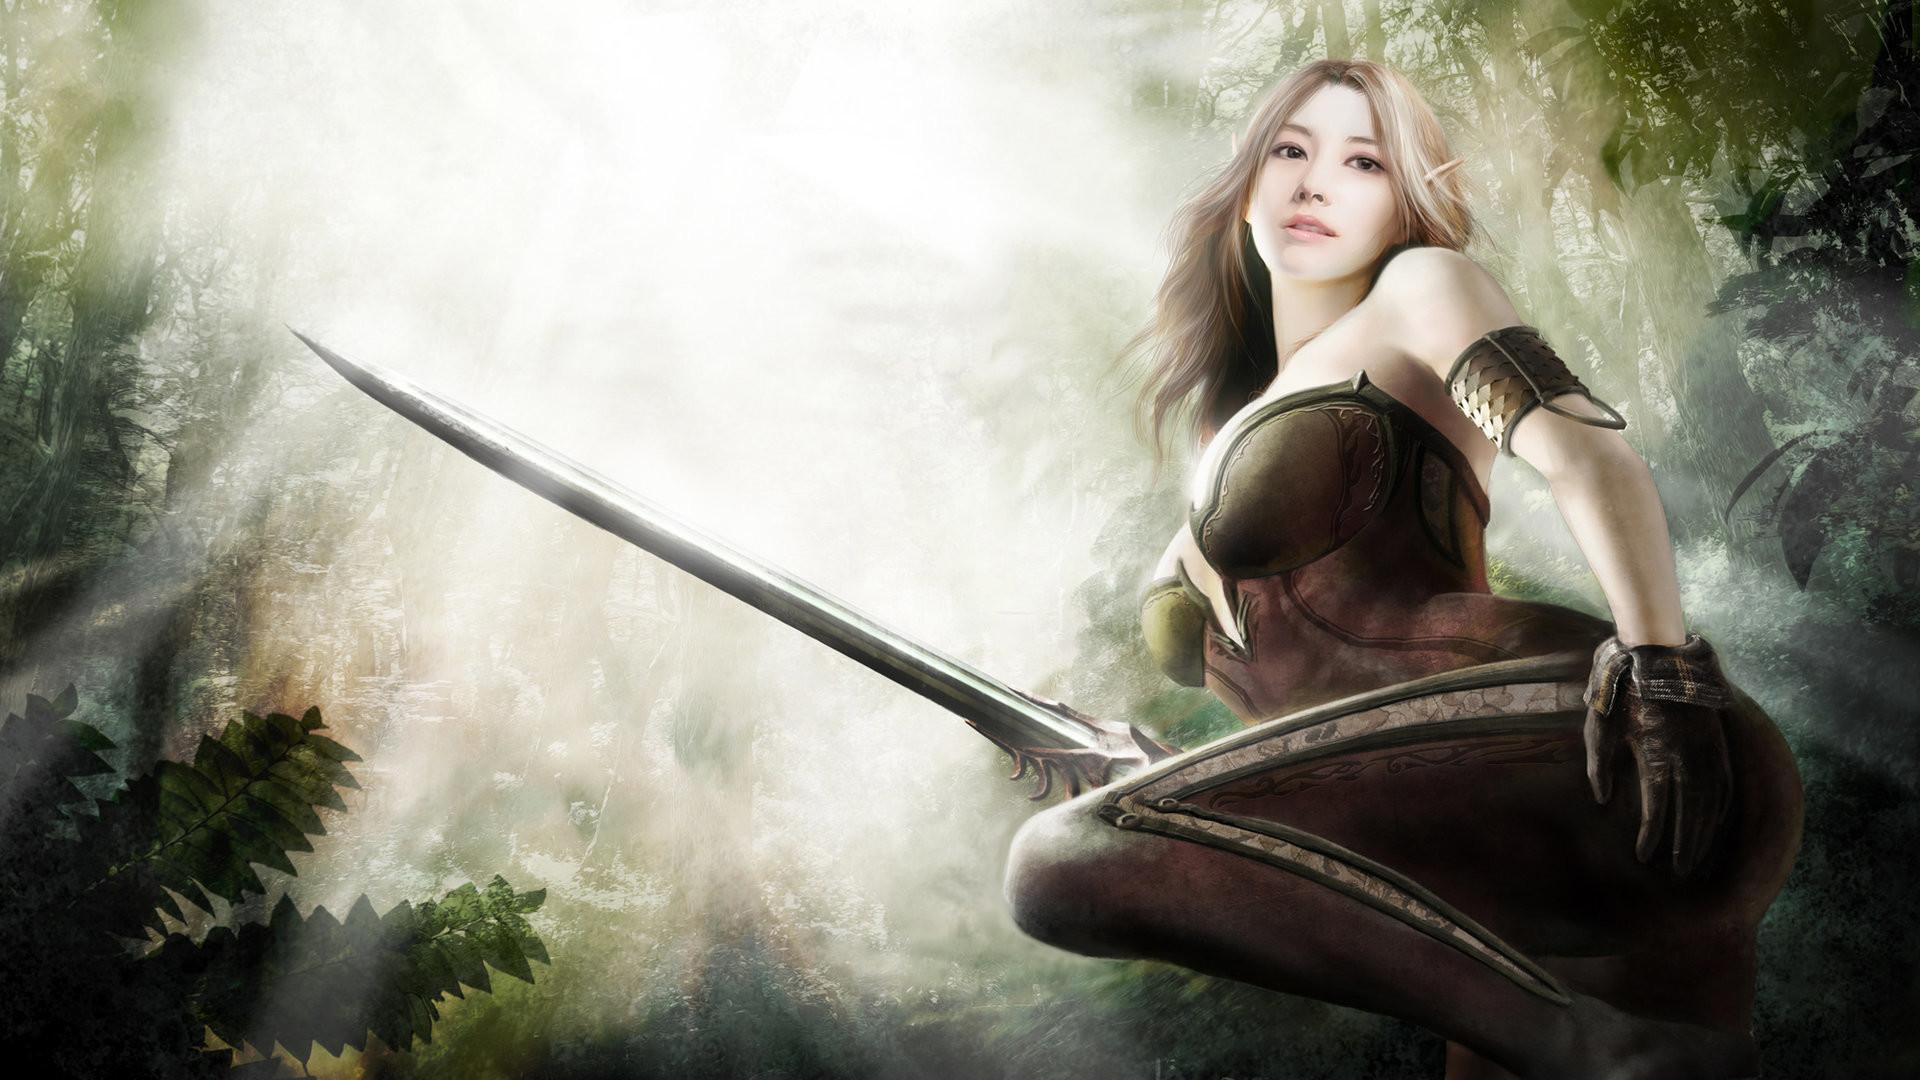 Fantasy Art Elves Wallpapers Hd Desktop And Mobile: Fantasy Female Warrior Wallpapers (77+ Images